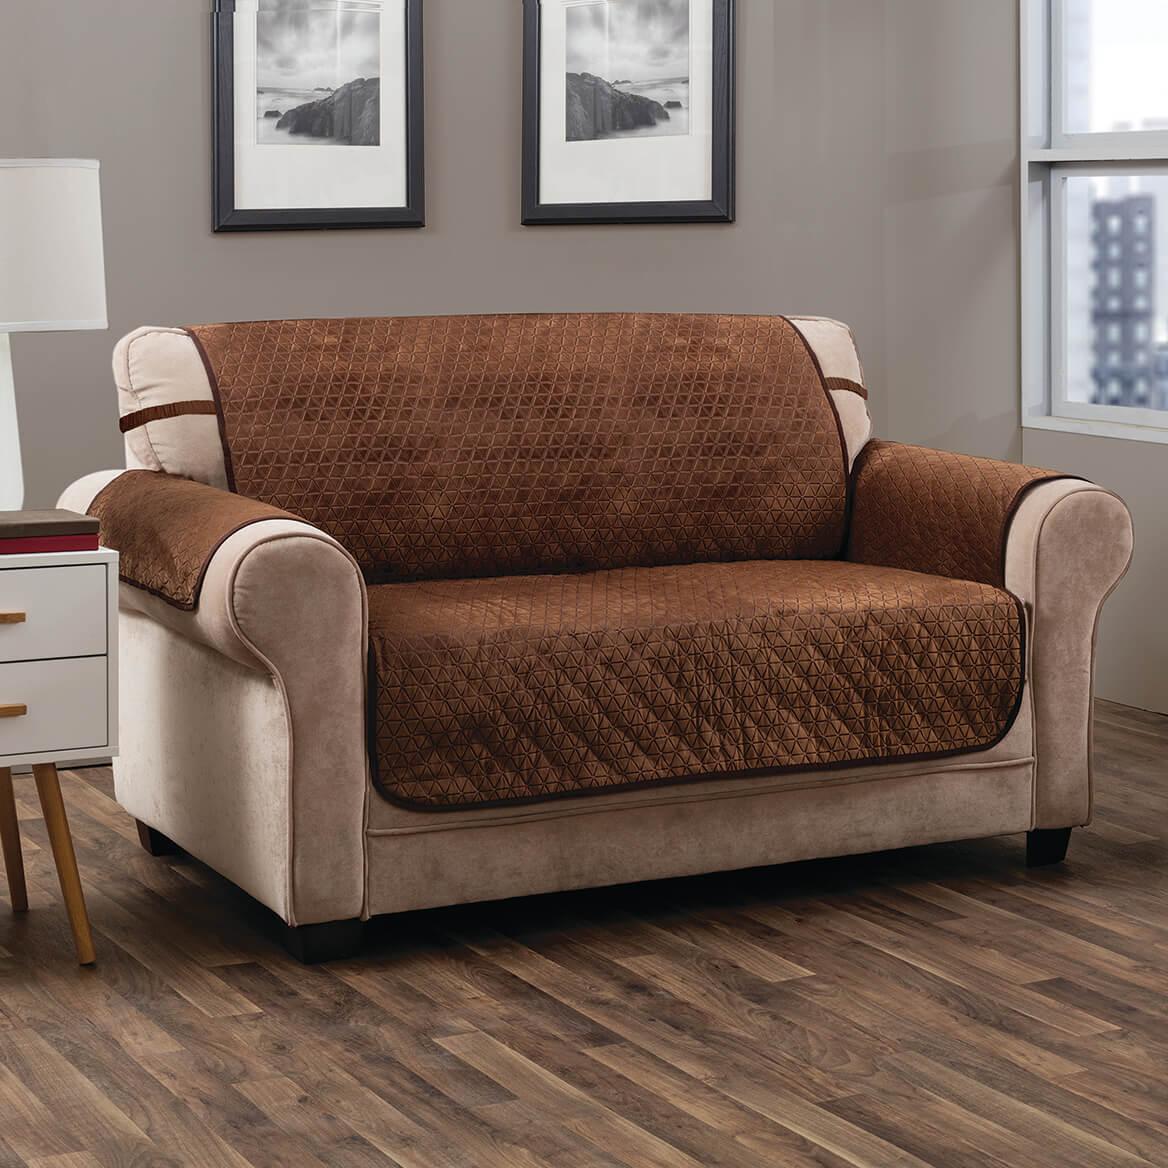 Prism XL Sofa Protector by OakRidge™-365409